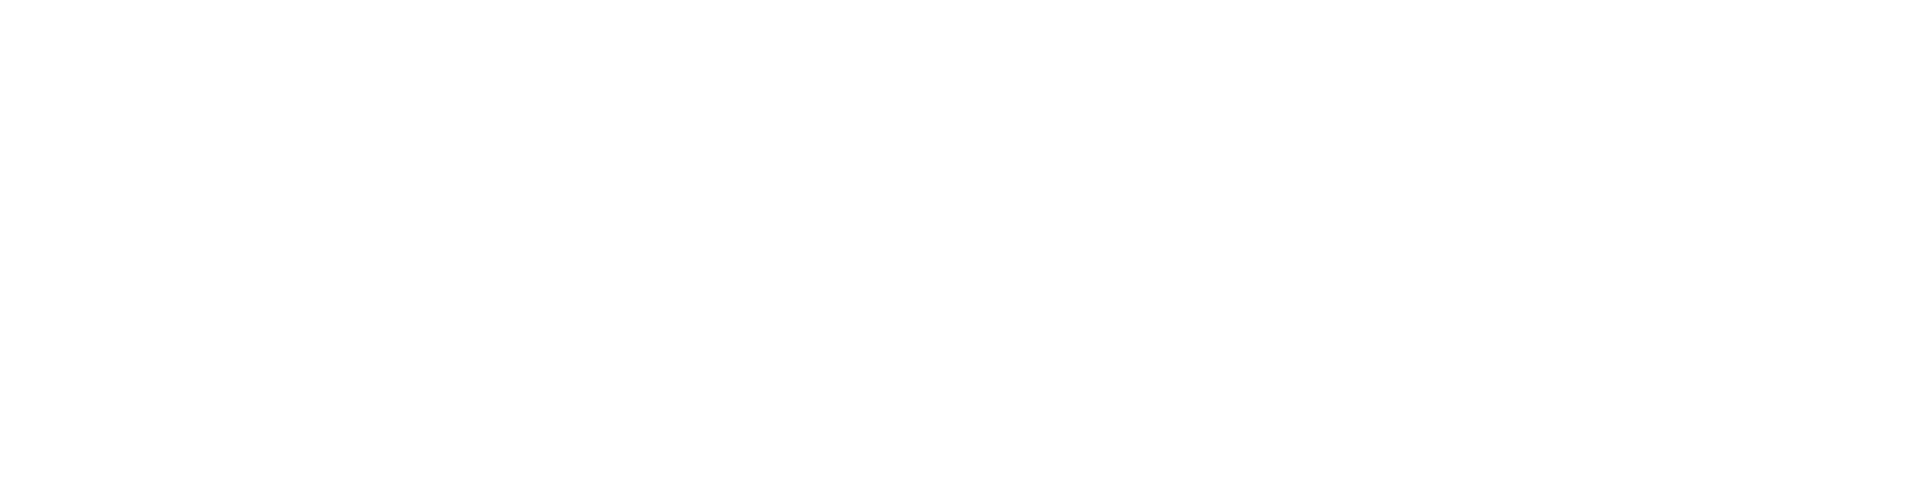 77a7a7